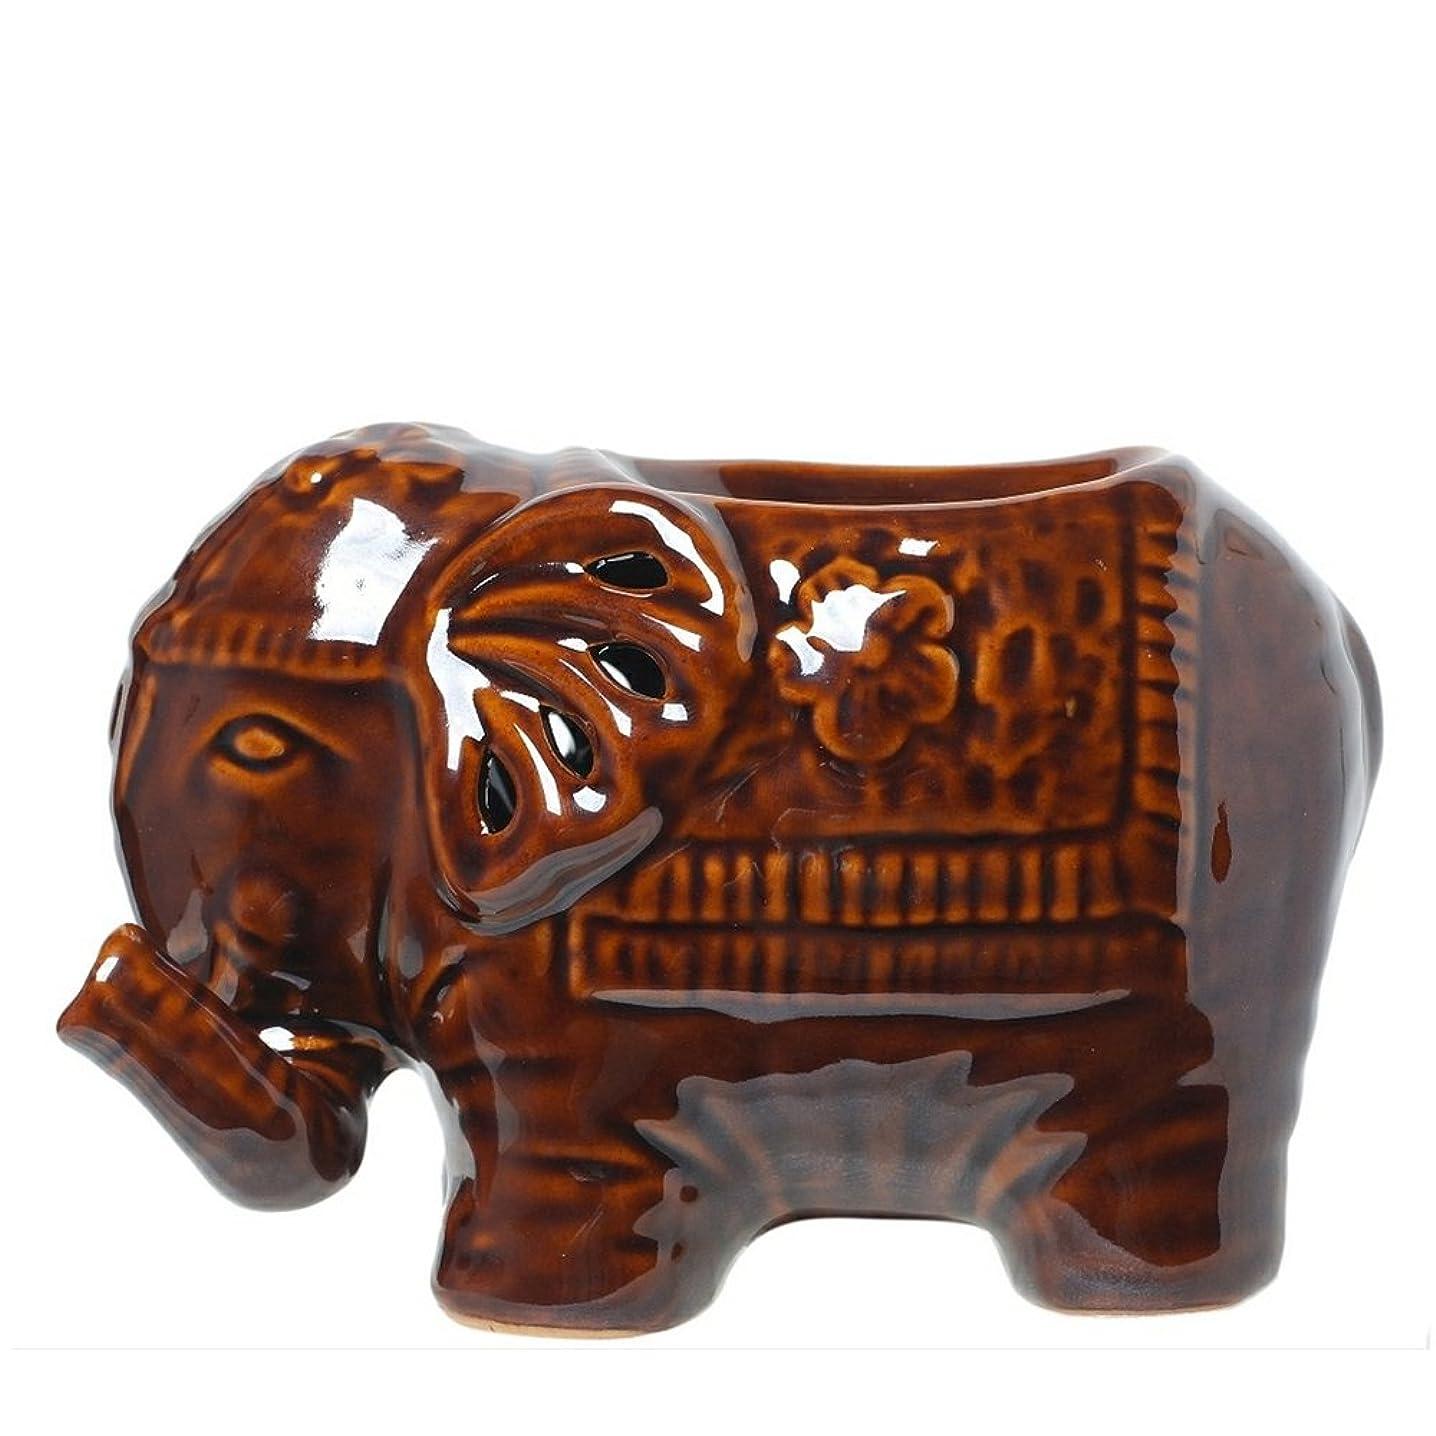 Hosley Elephant Ceramic Oil Warmers - 6